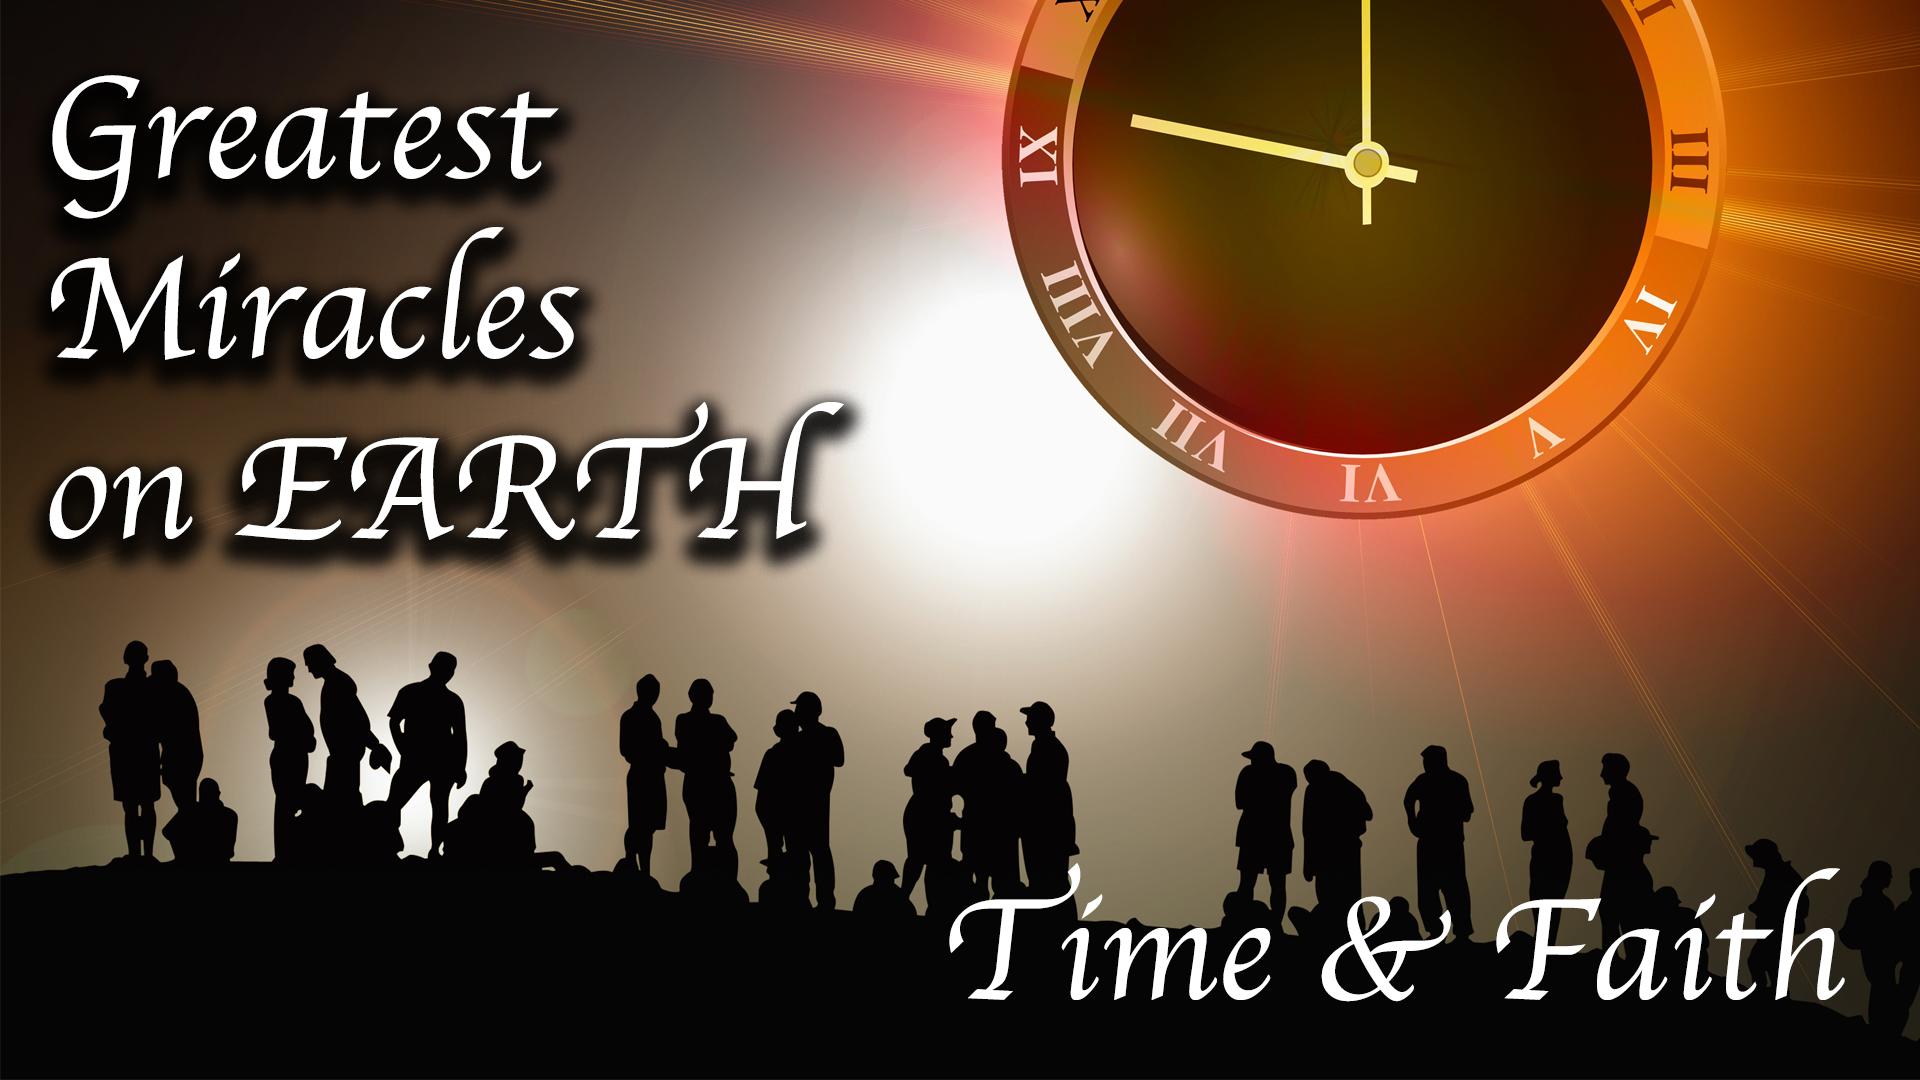 The Greatest Miracles on Earth: Time & Faith